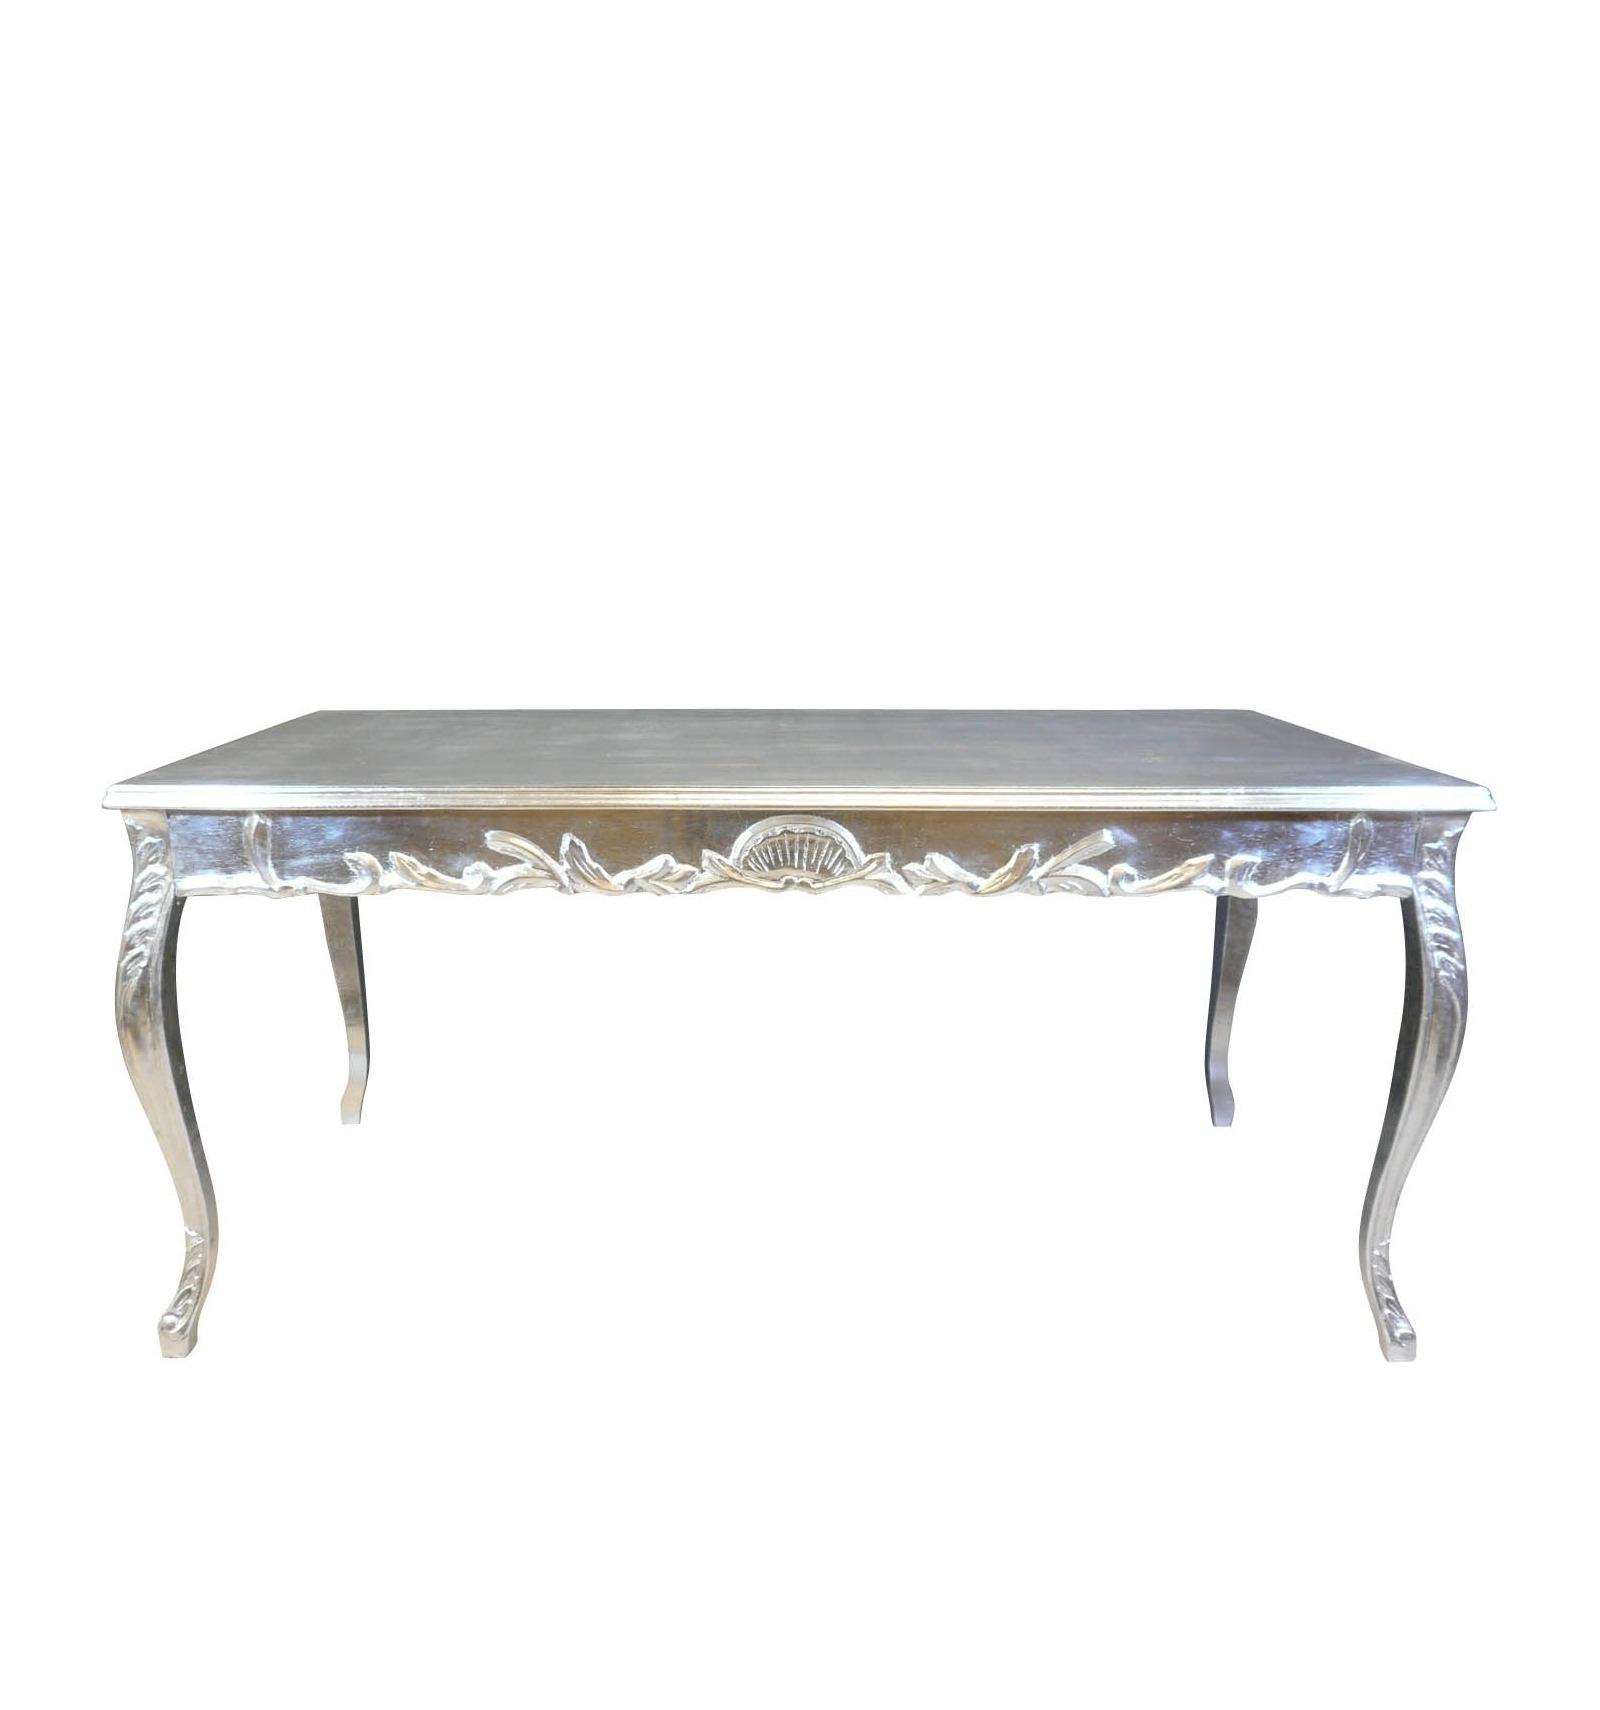 table baroque argent e de salle manger mobilier de style. Black Bedroom Furniture Sets. Home Design Ideas